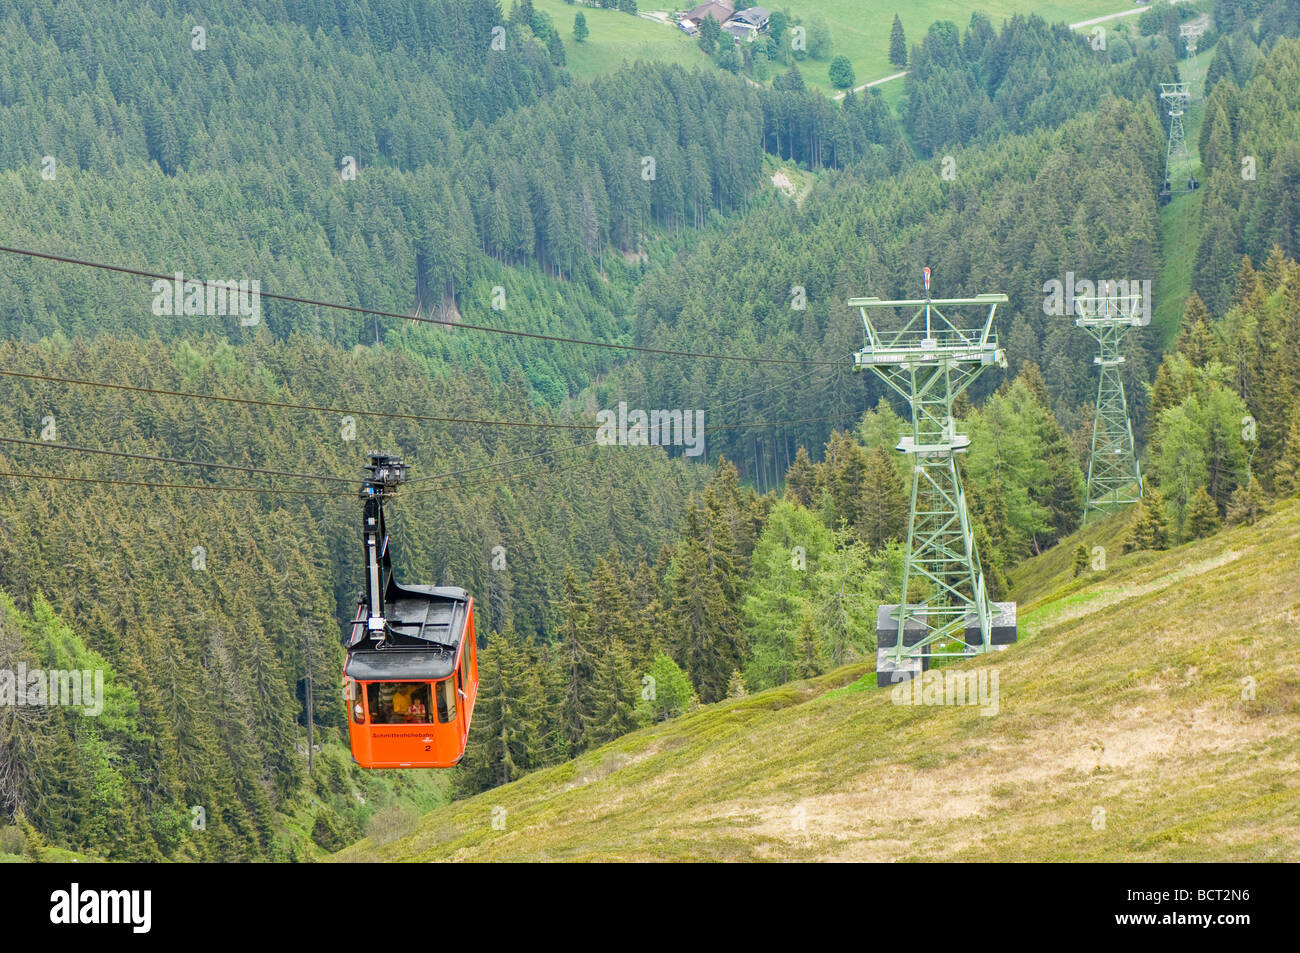 Schmittenhohe cable car taking passengers from Schmitten to Schmittenhohe ski resort in Austria Stock Photo